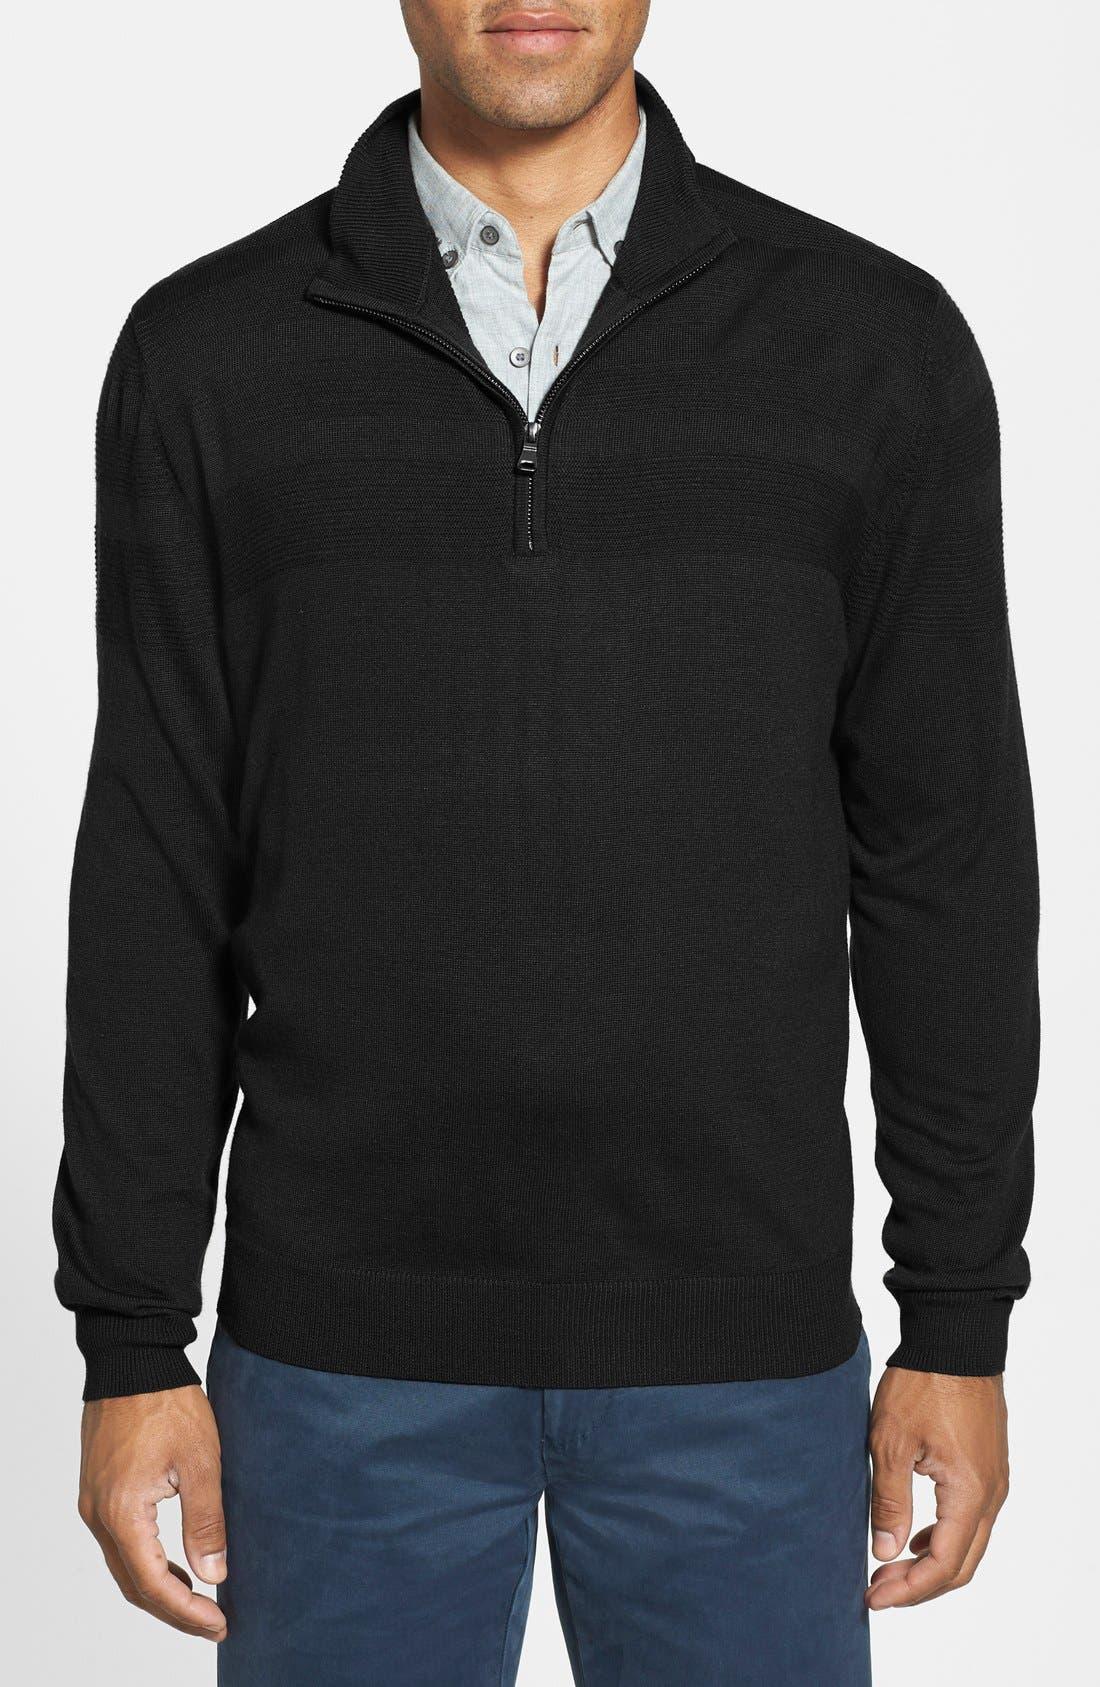 Main Image - Cutter & Buck 'Douglas' Merino Wool Blend Half Zip Sweater (Big & Tall)